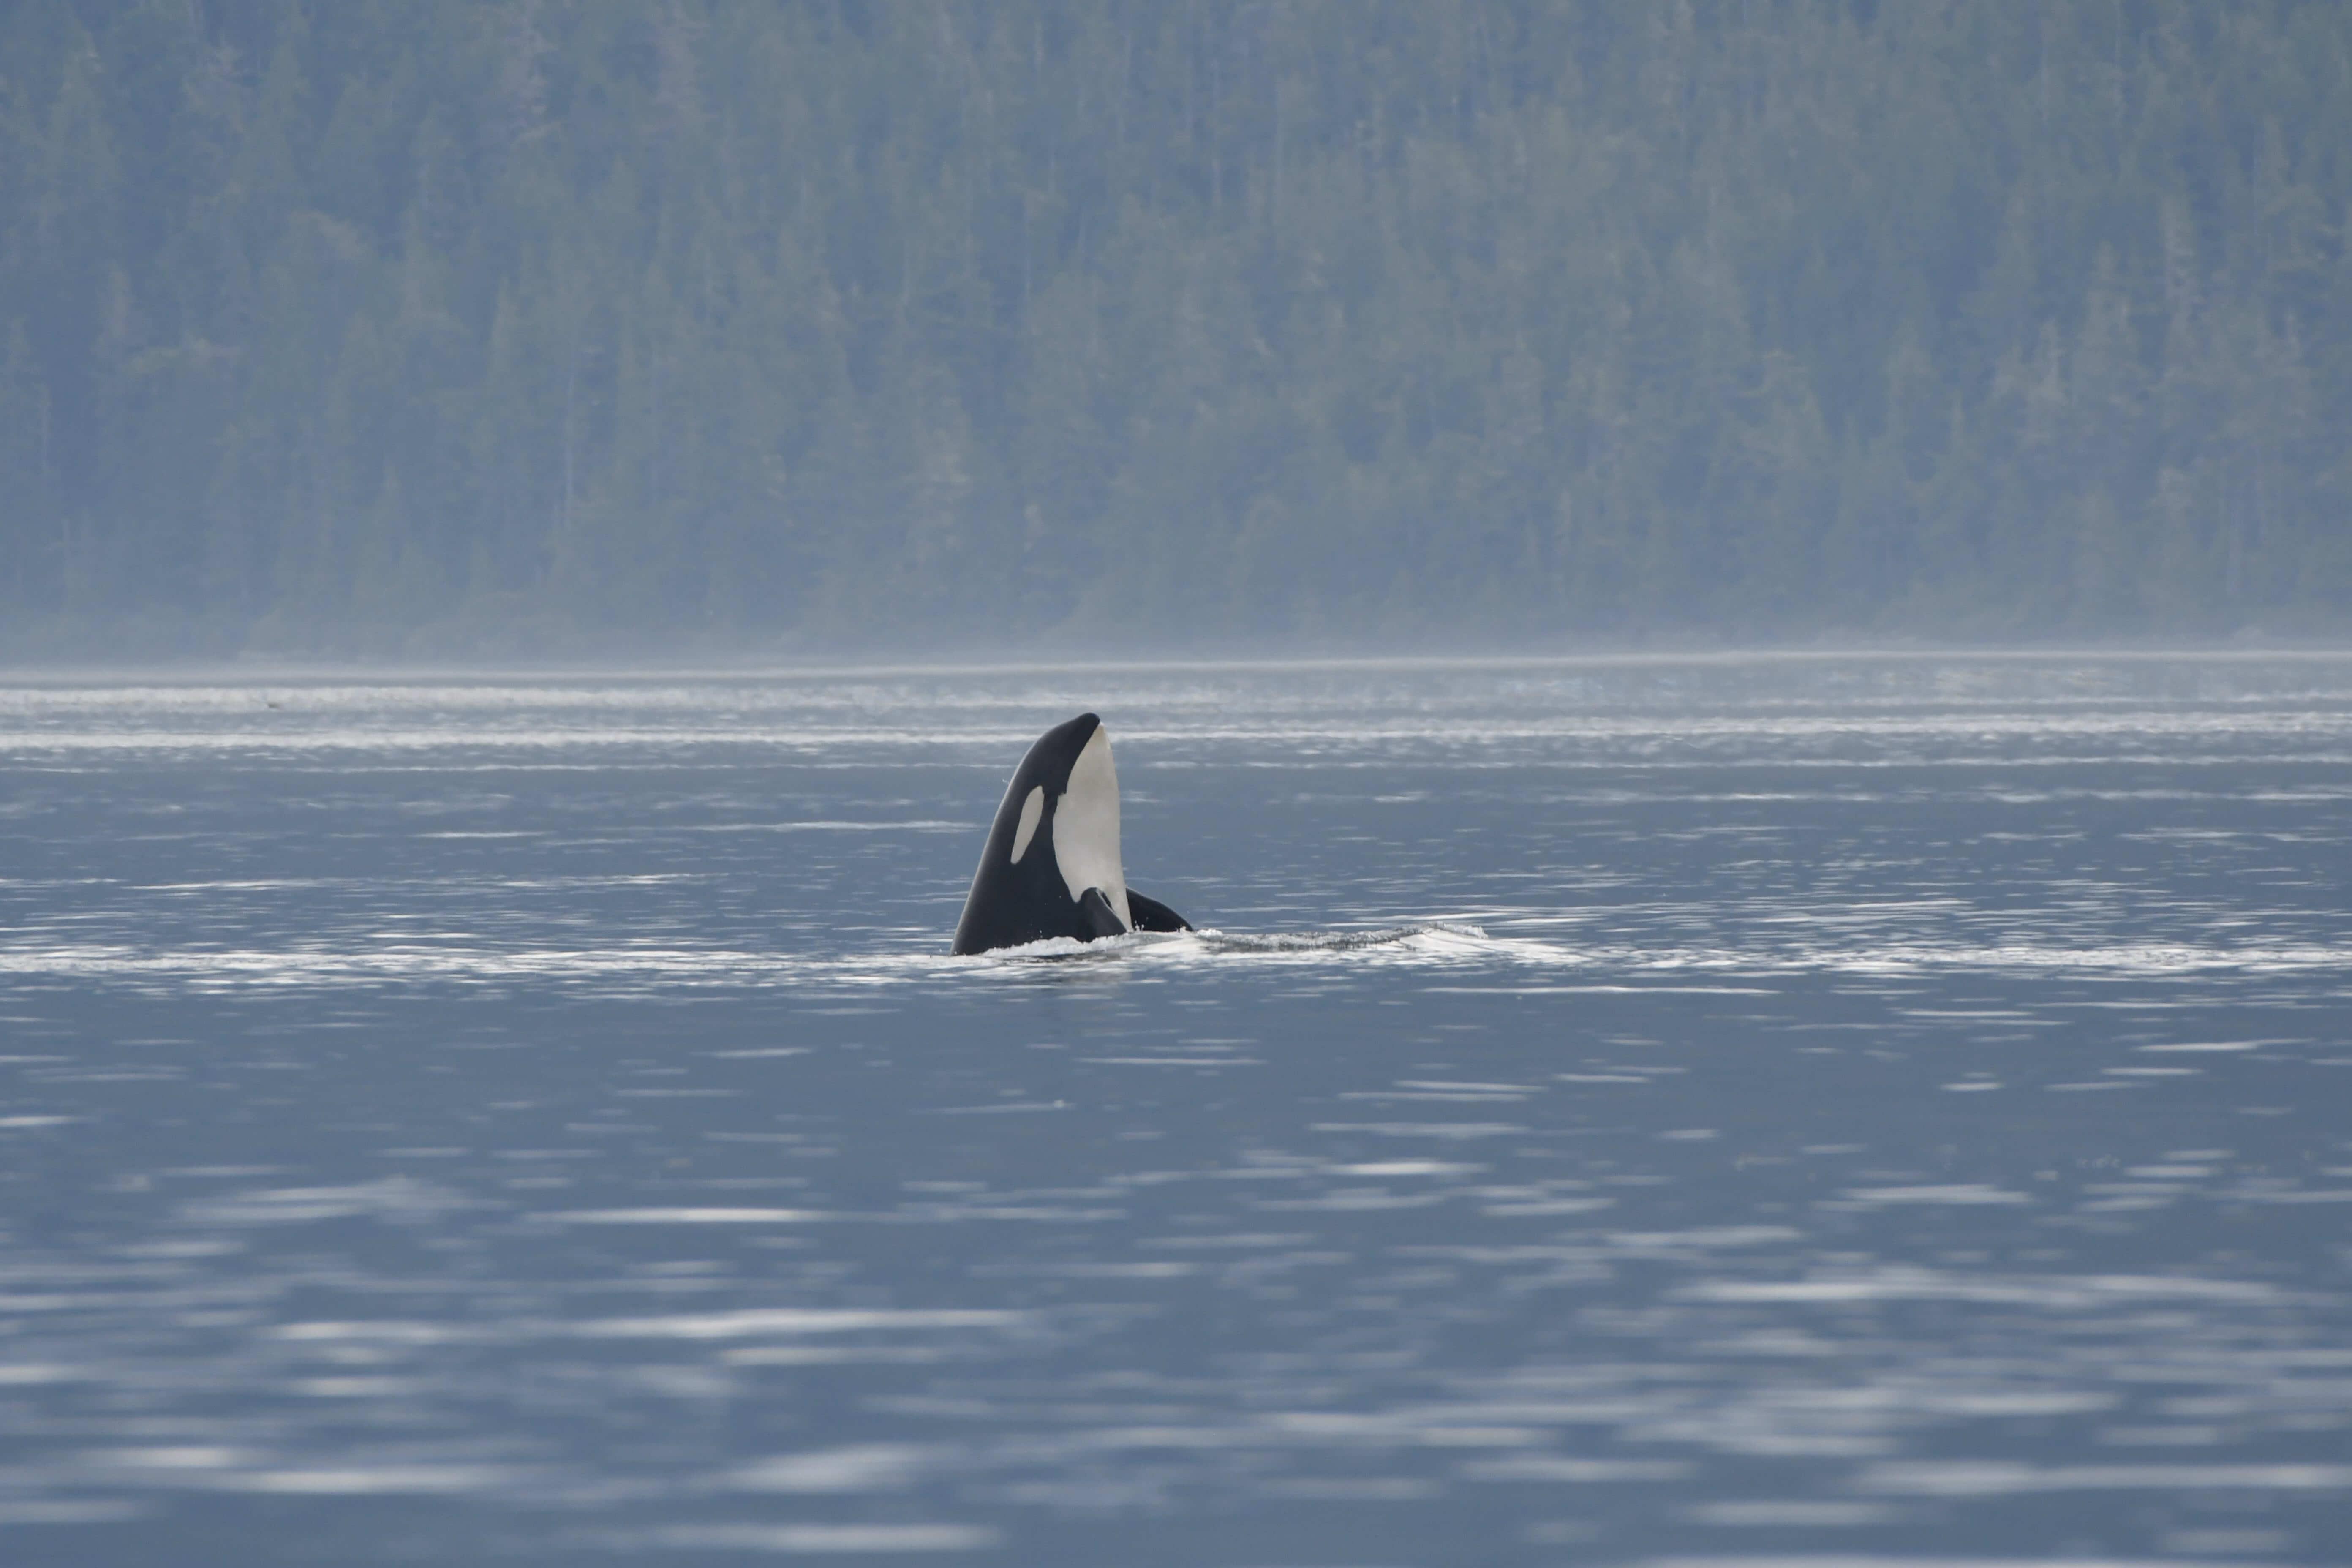 spyhopping orca Johnstone Strait BC